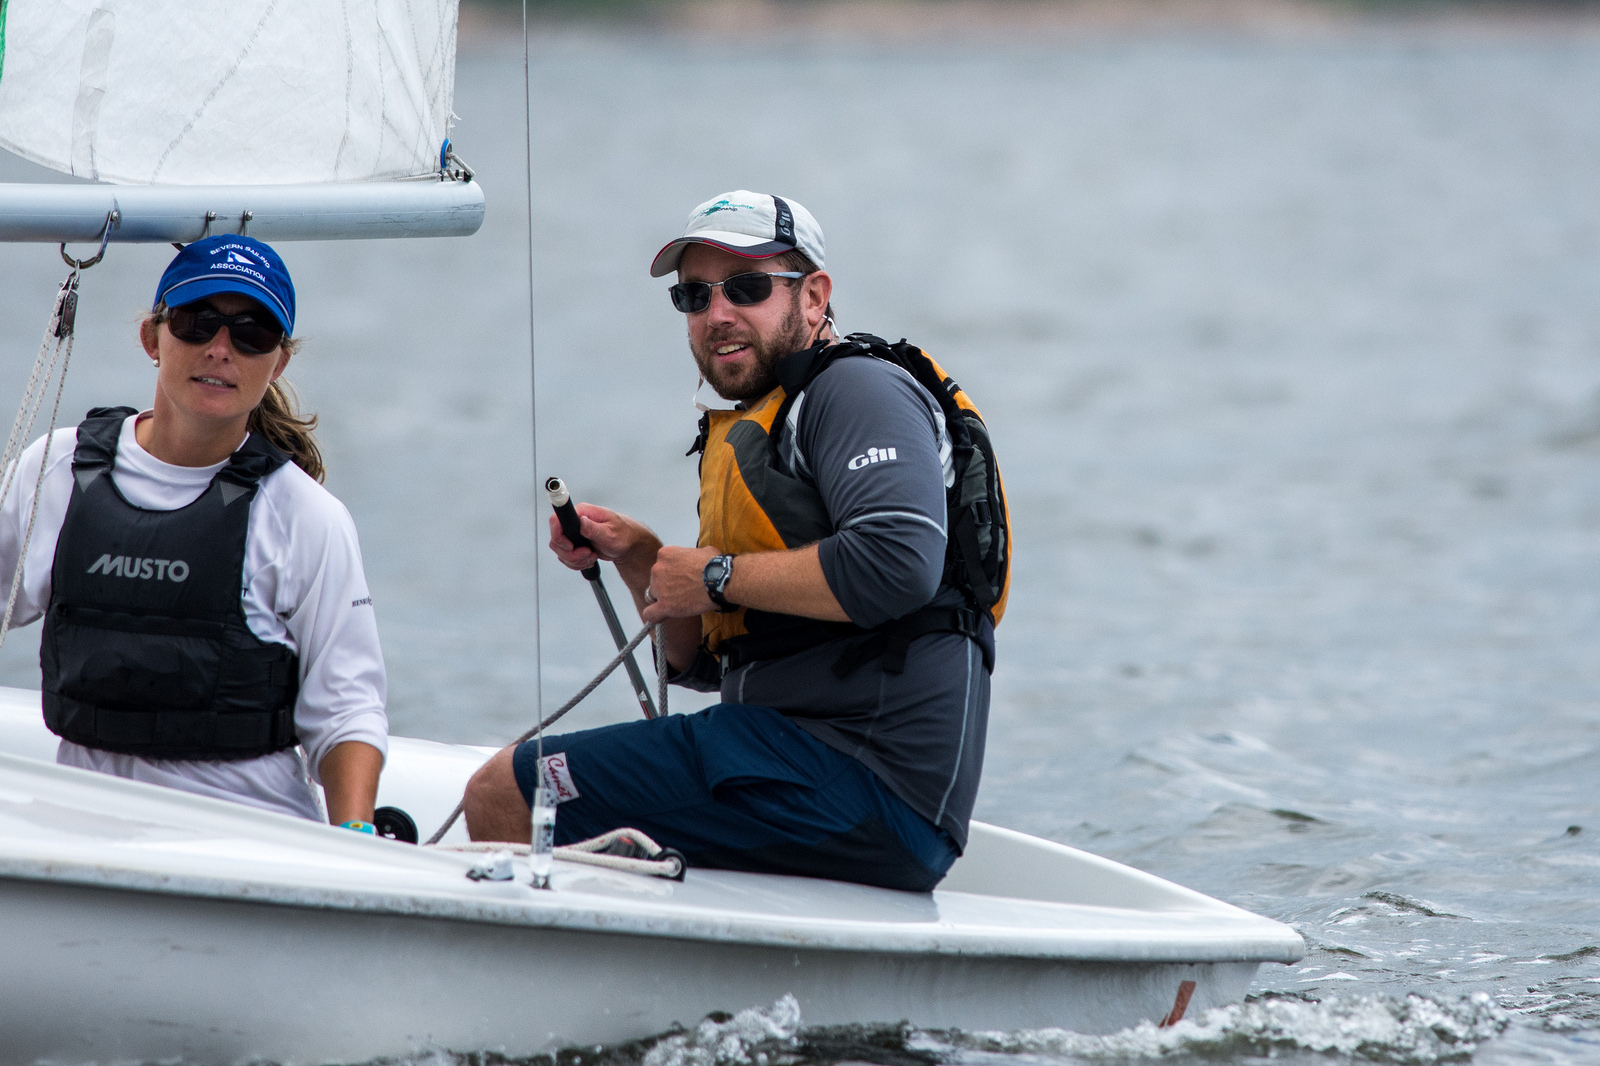 partner, sailing